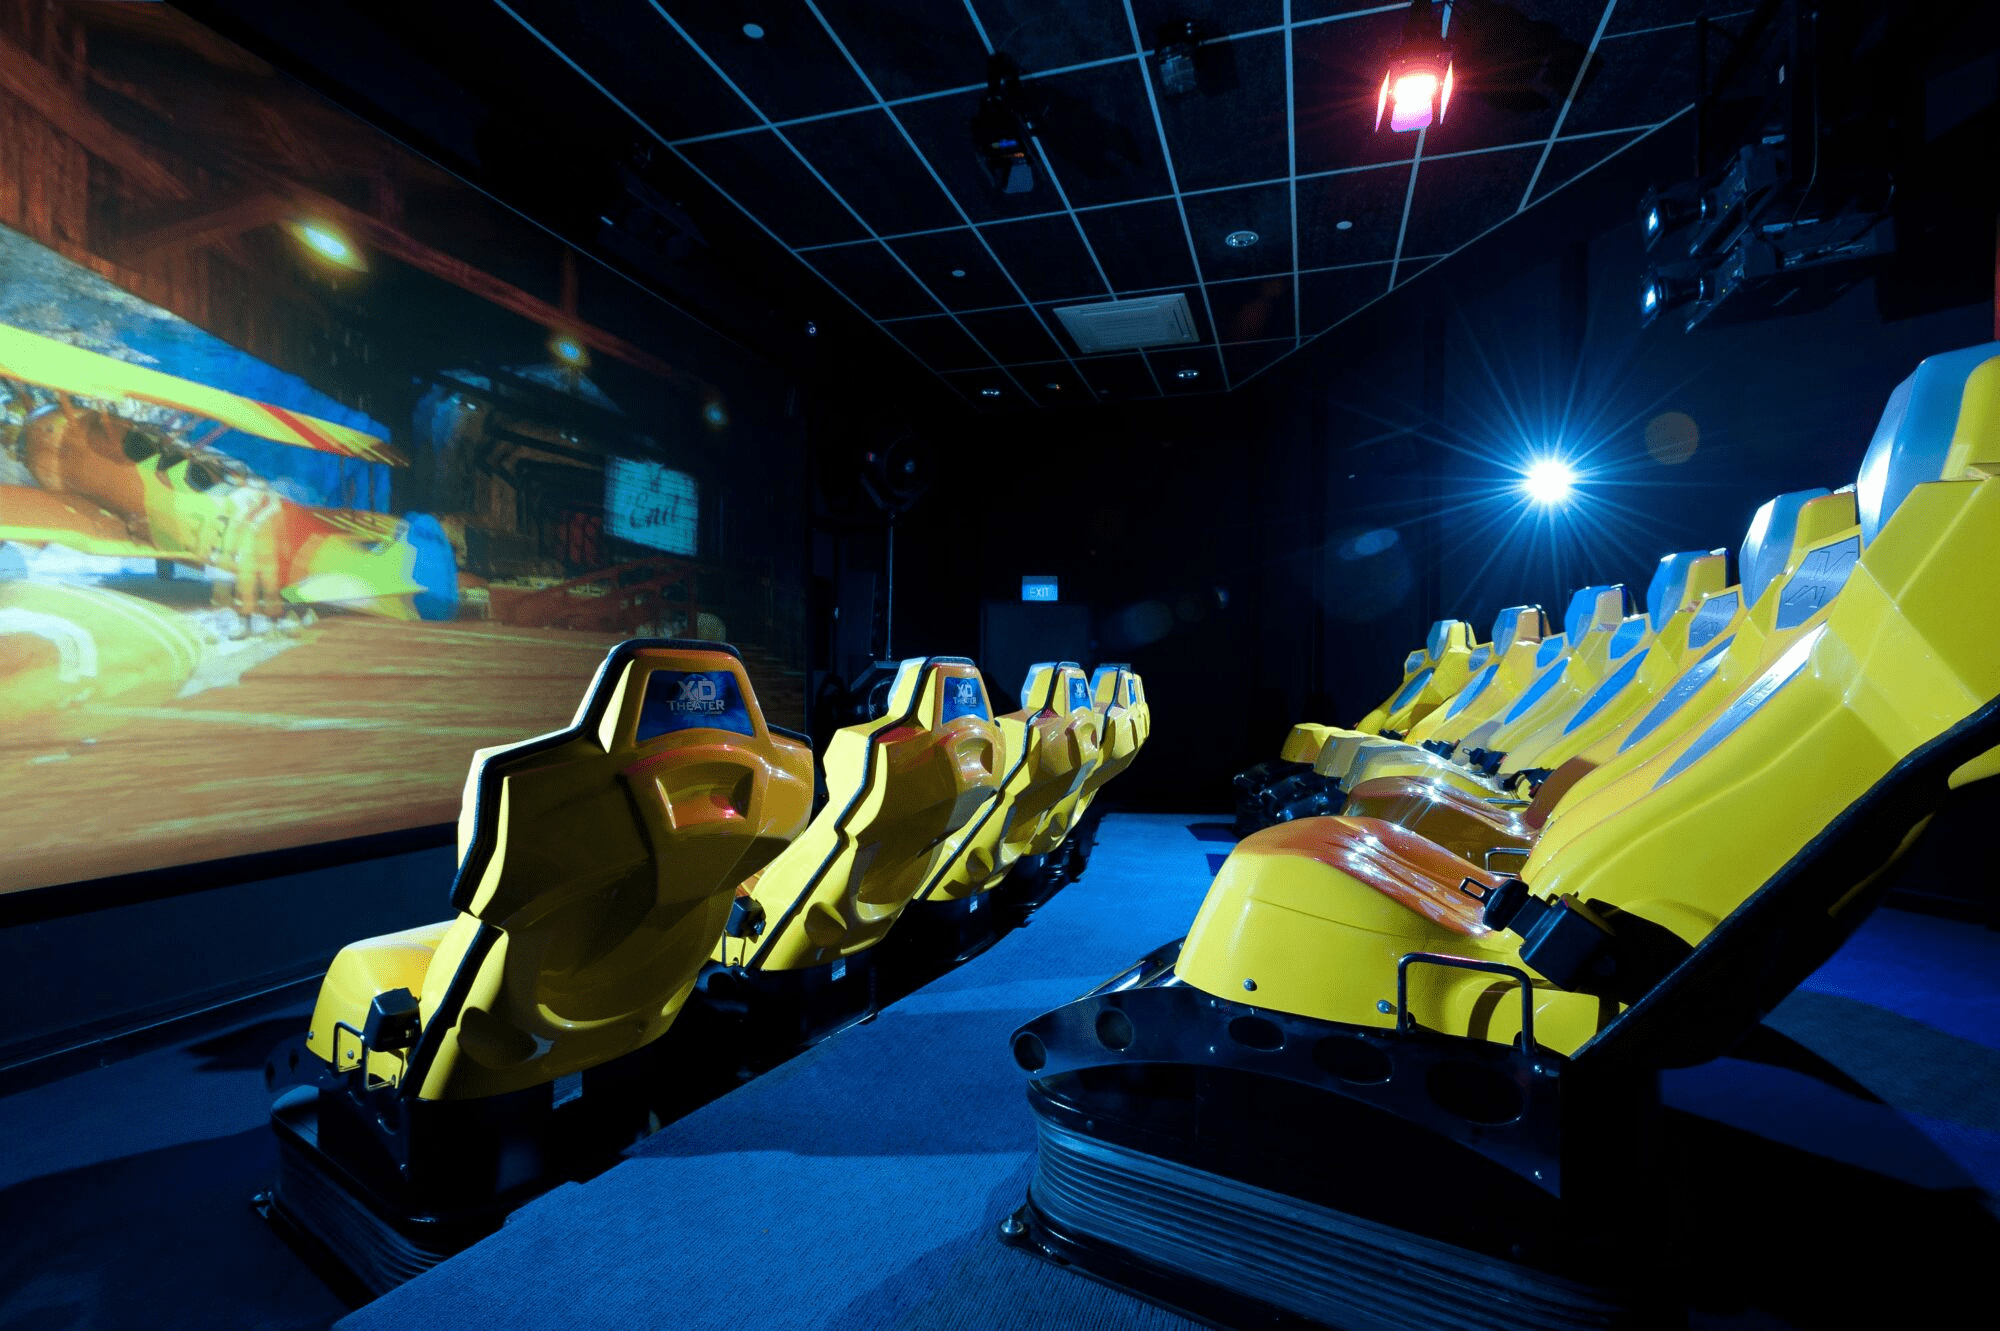 iWERKS Theatre - Largest Cinema Singapore